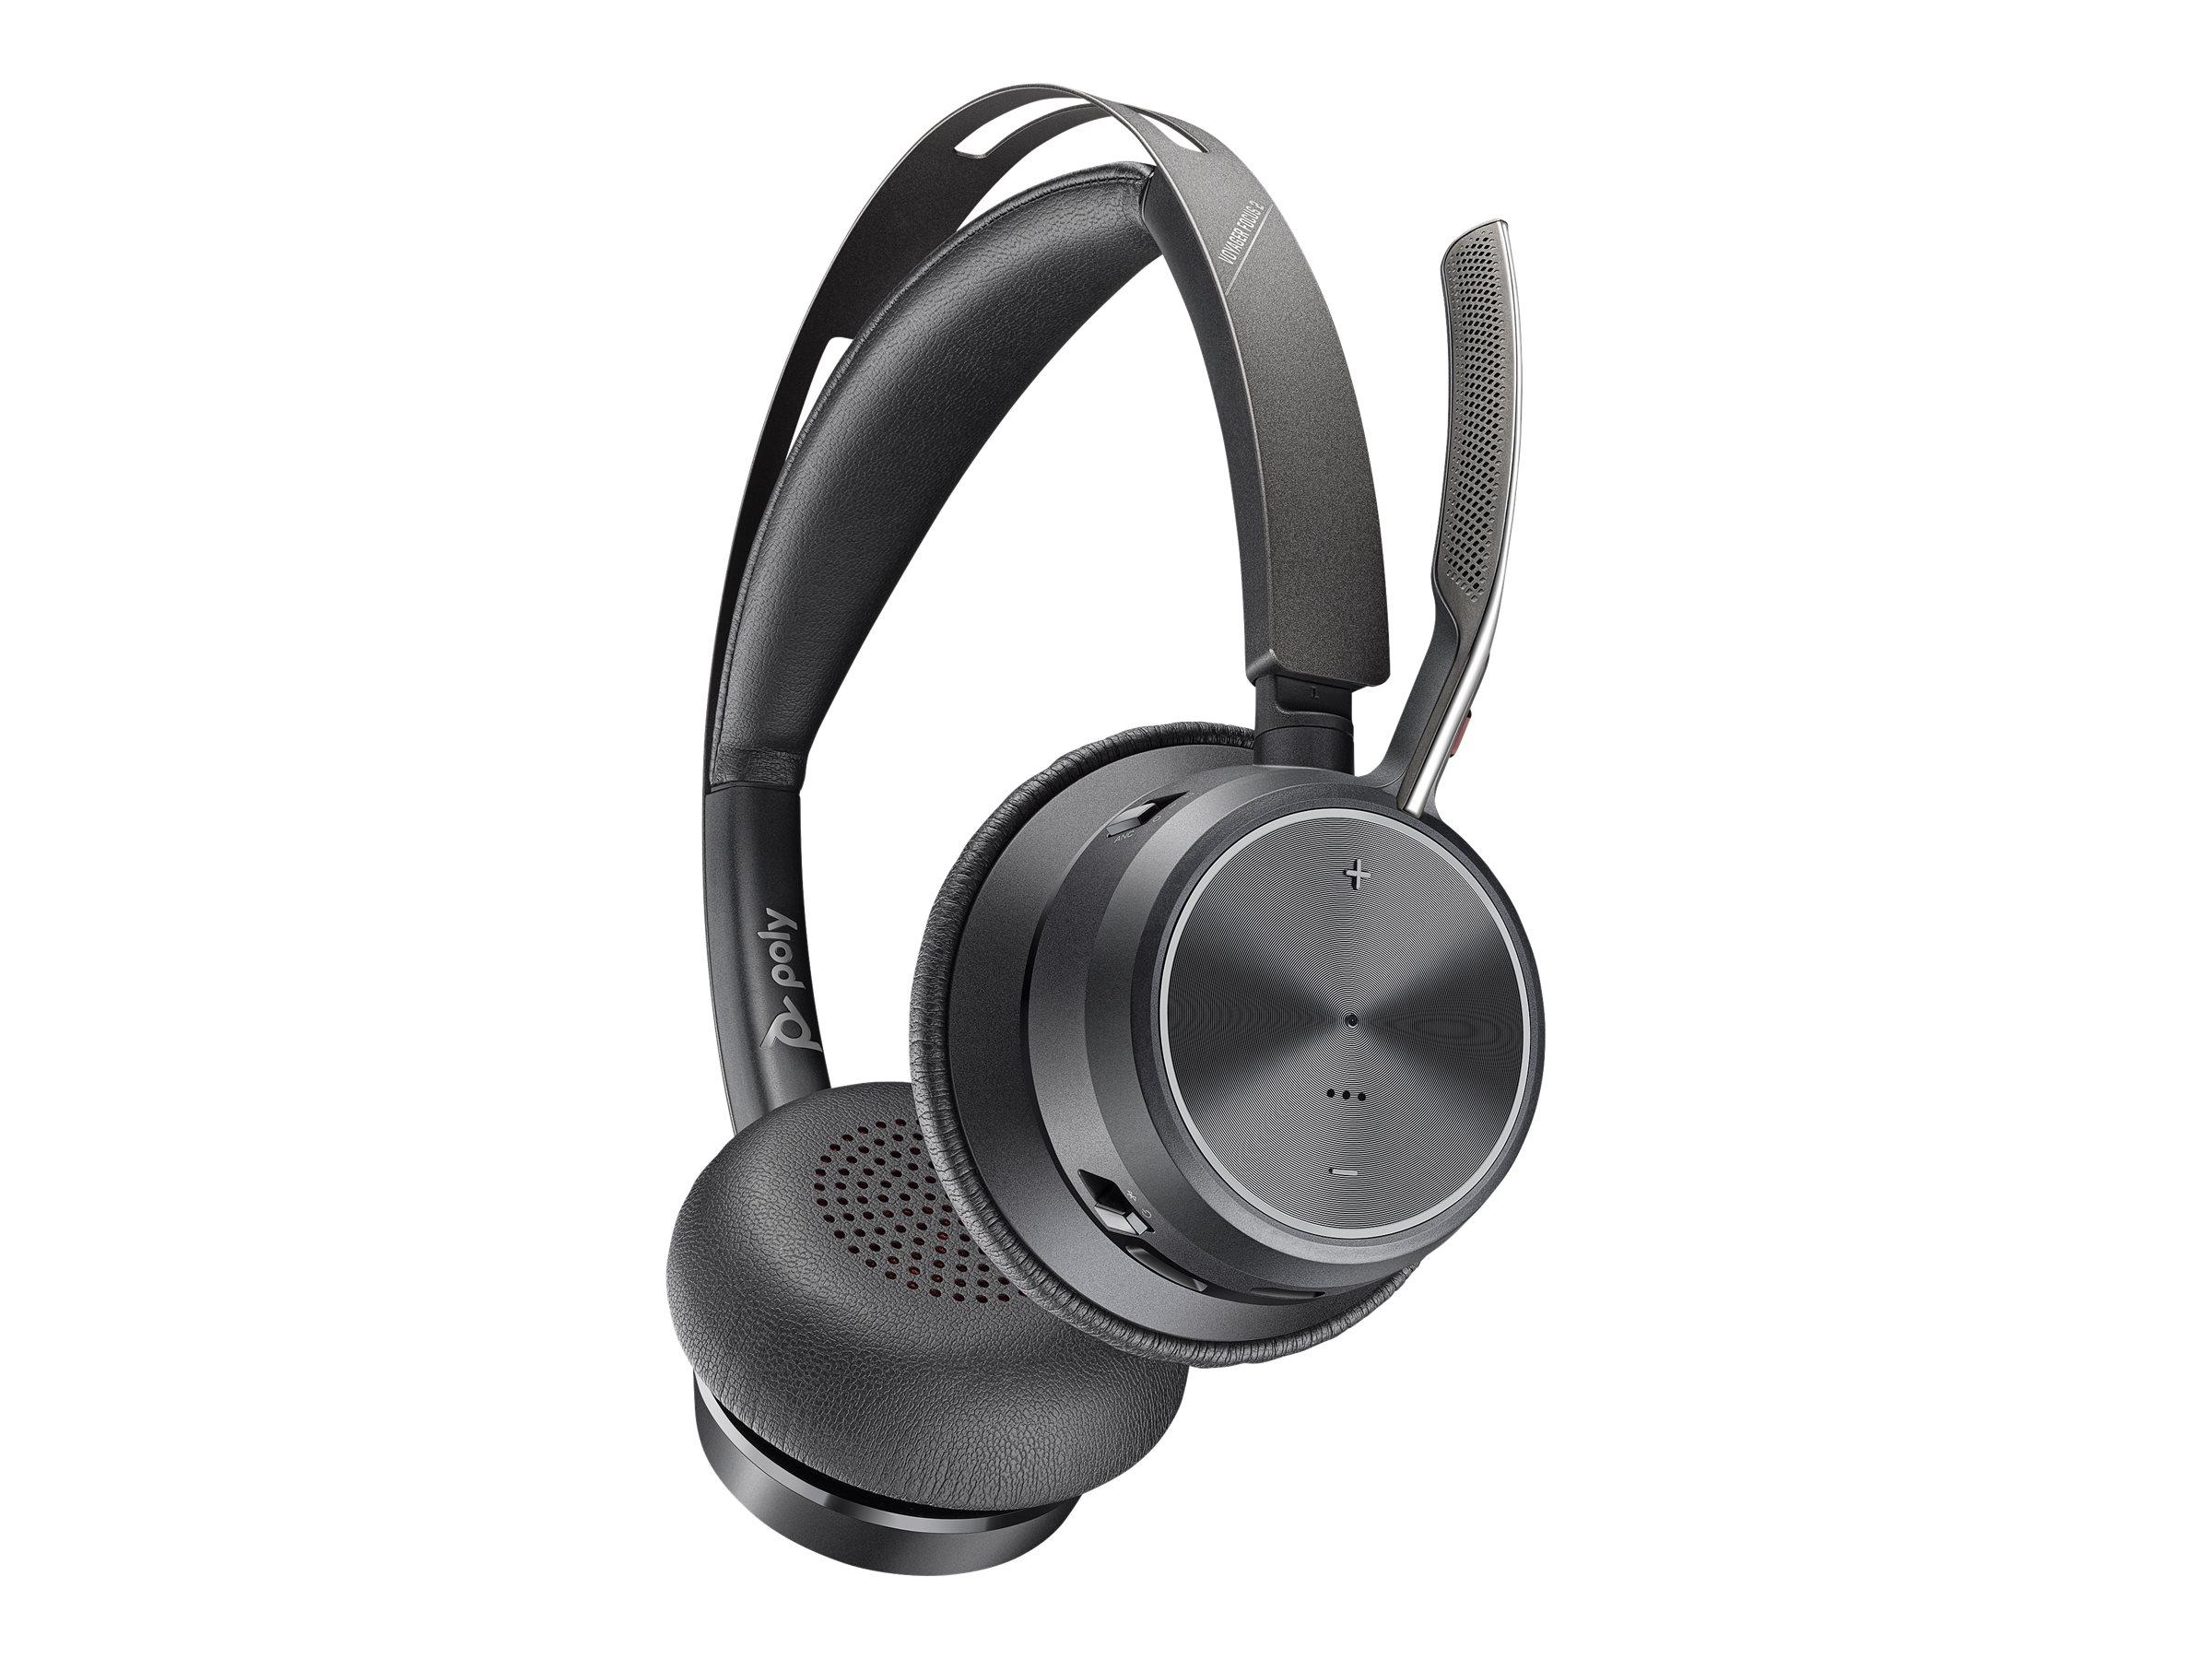 Poly Voyager Focus 2 UC - Headset - On-Ear - Bluetooth - kabellos, kabelgebunden - aktive Rauschunterdrückung